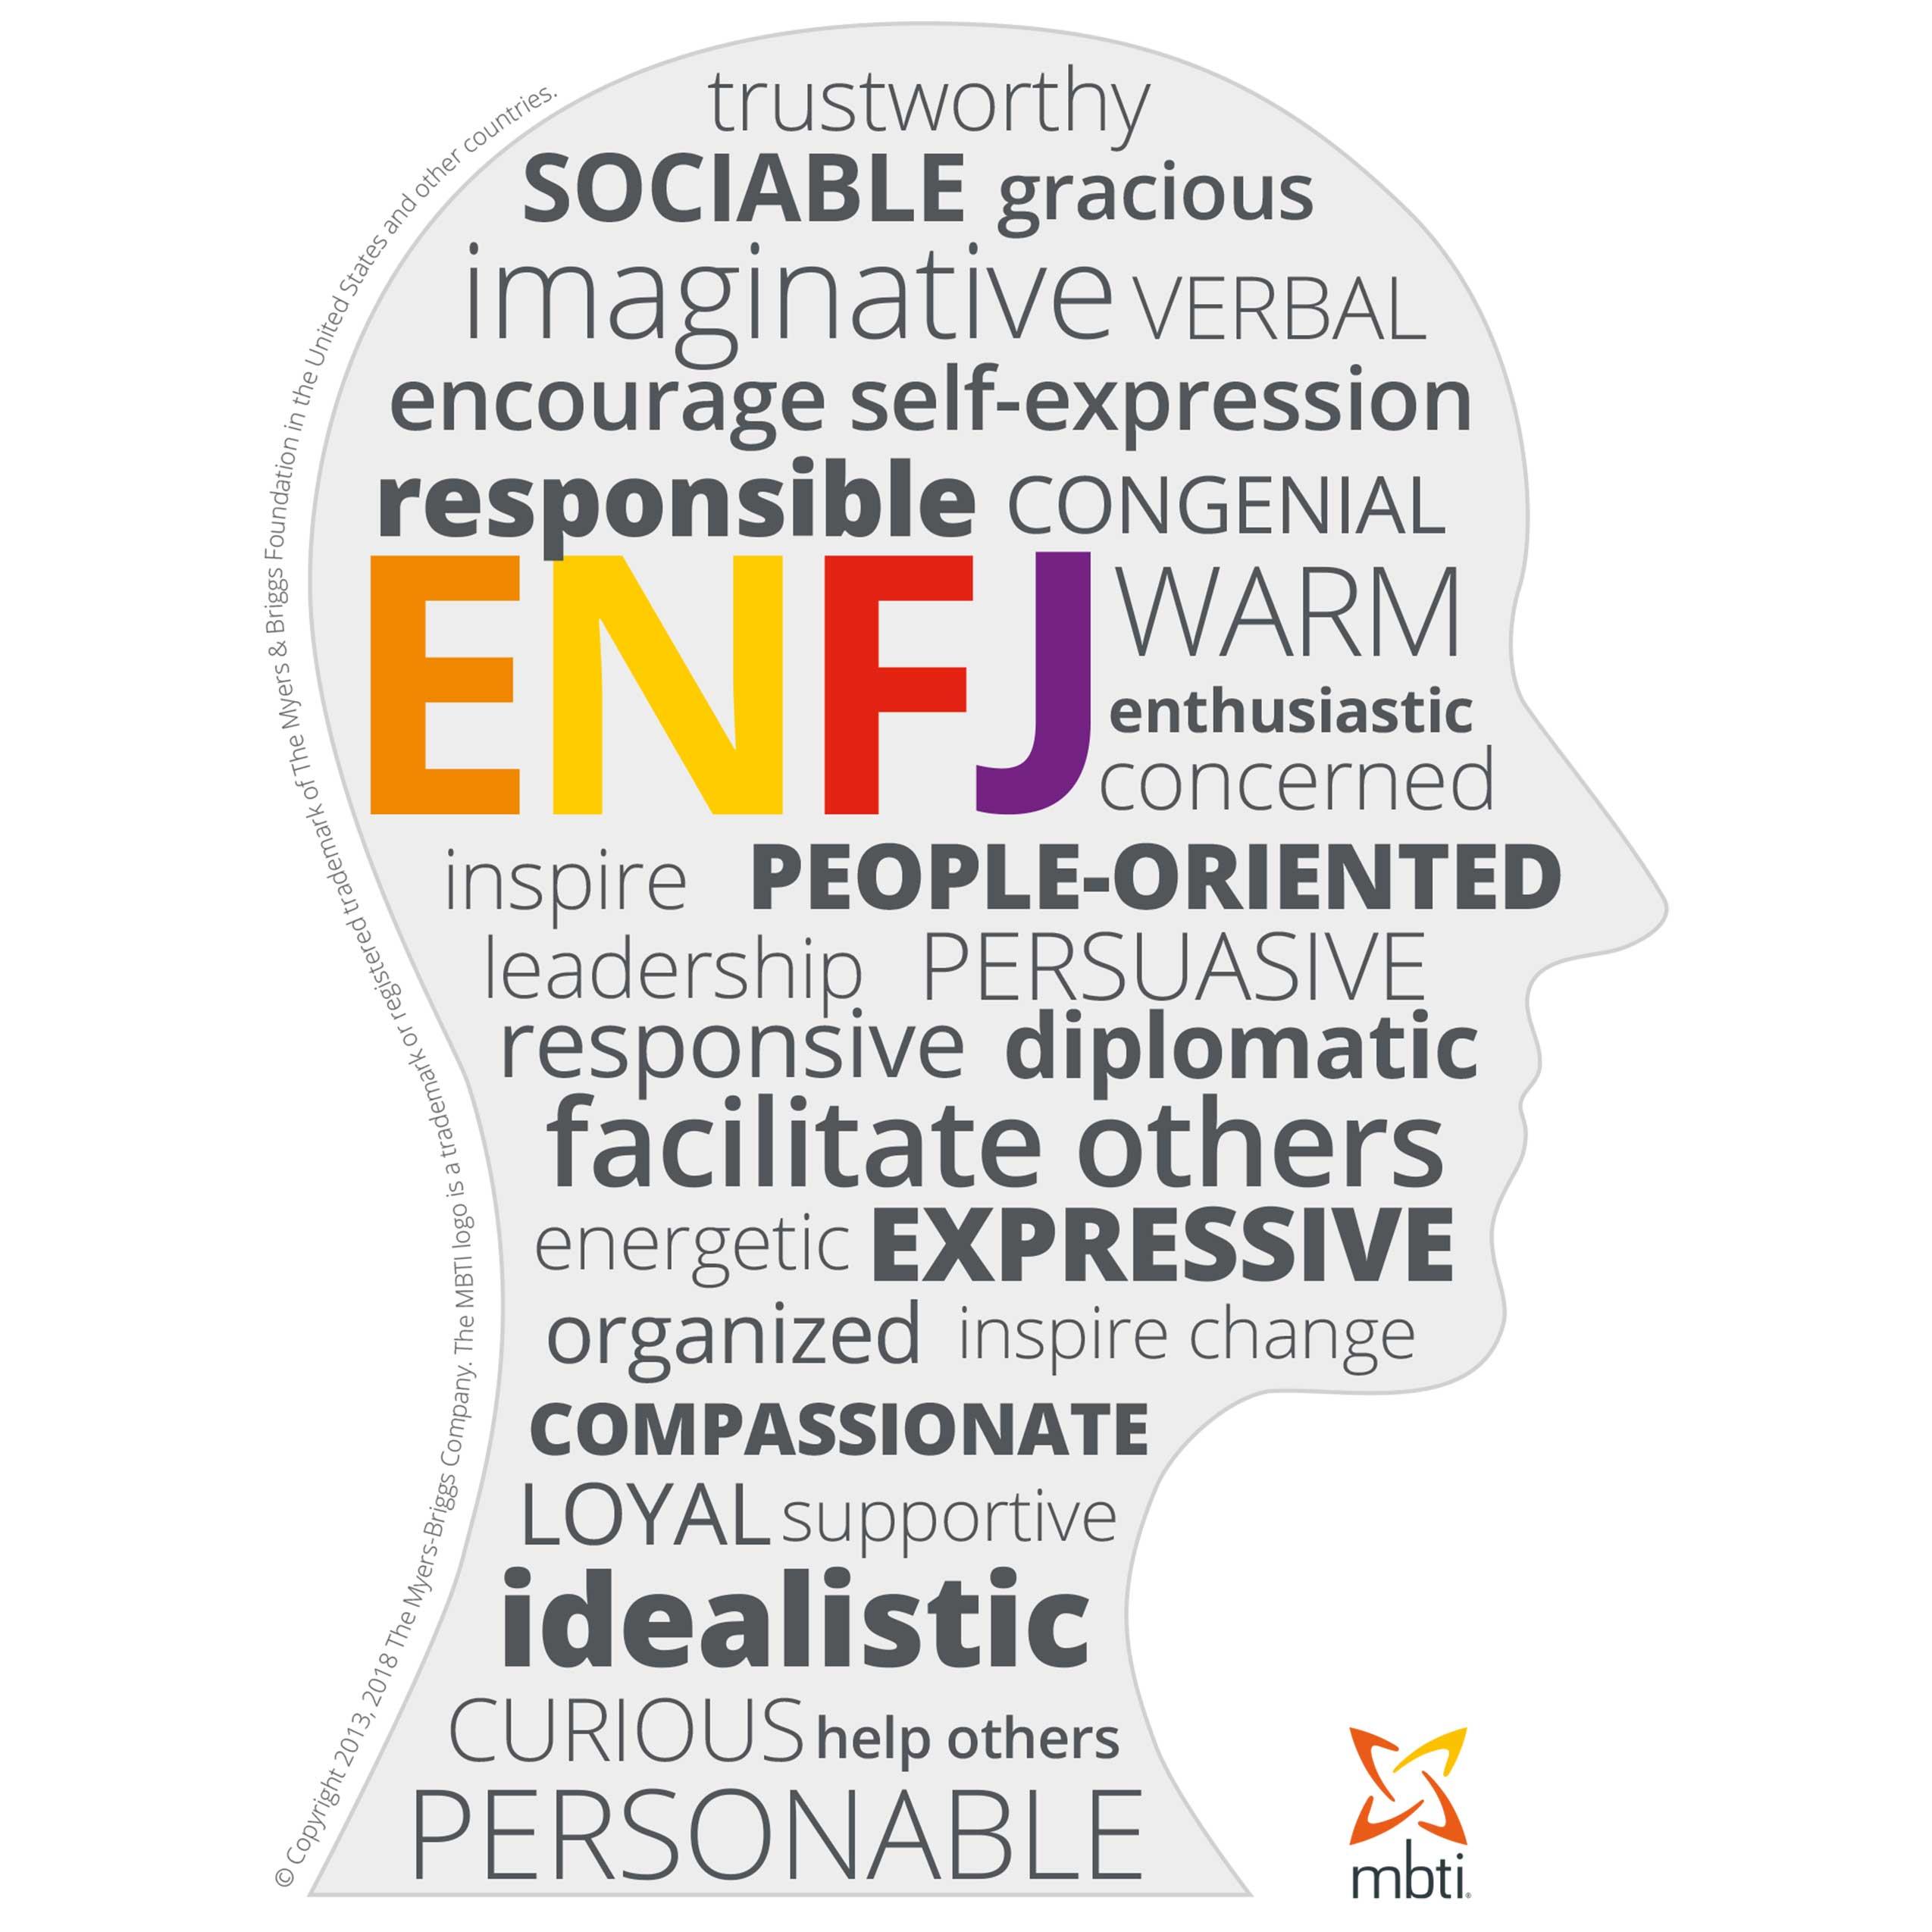 MBTI Myers-Briggs Personality Type Characteristics ENFJ